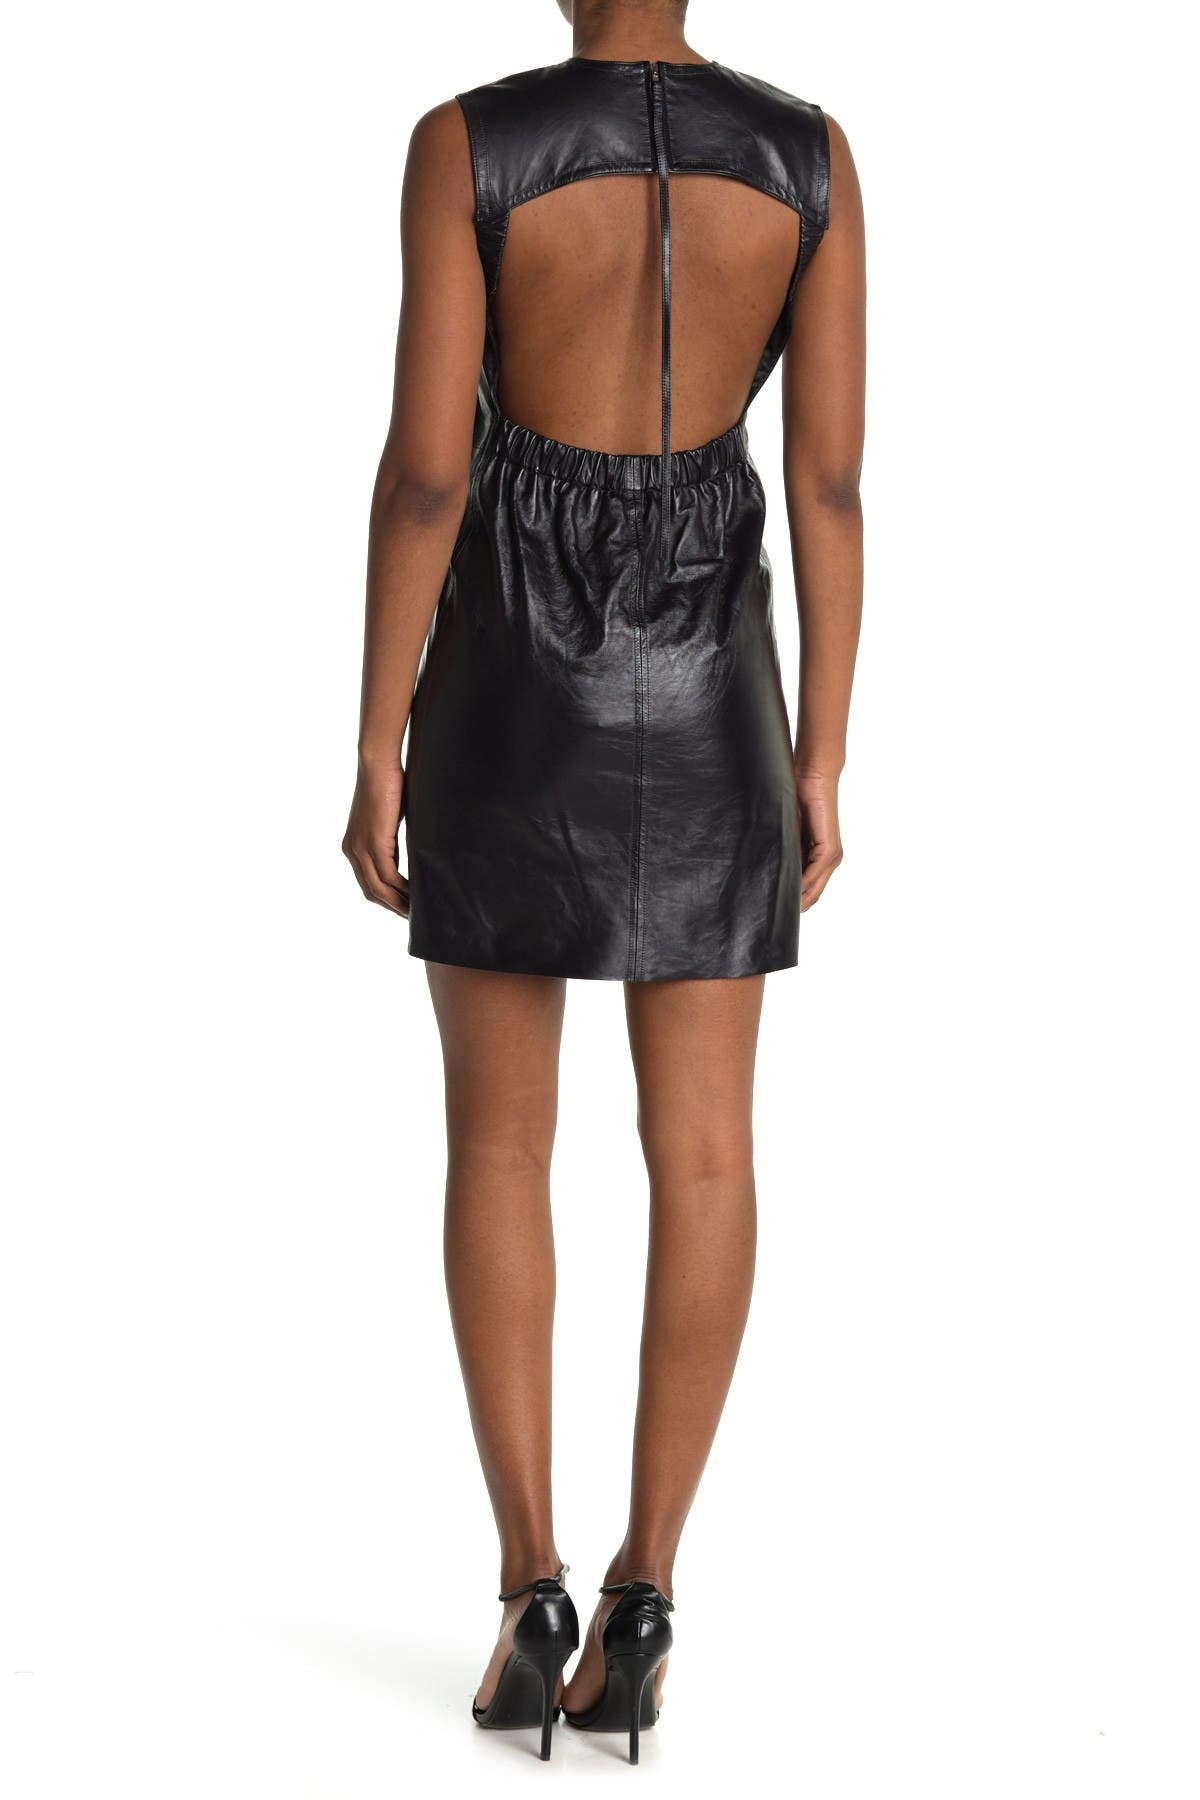 Helmut Lang Open Back Leather Dress